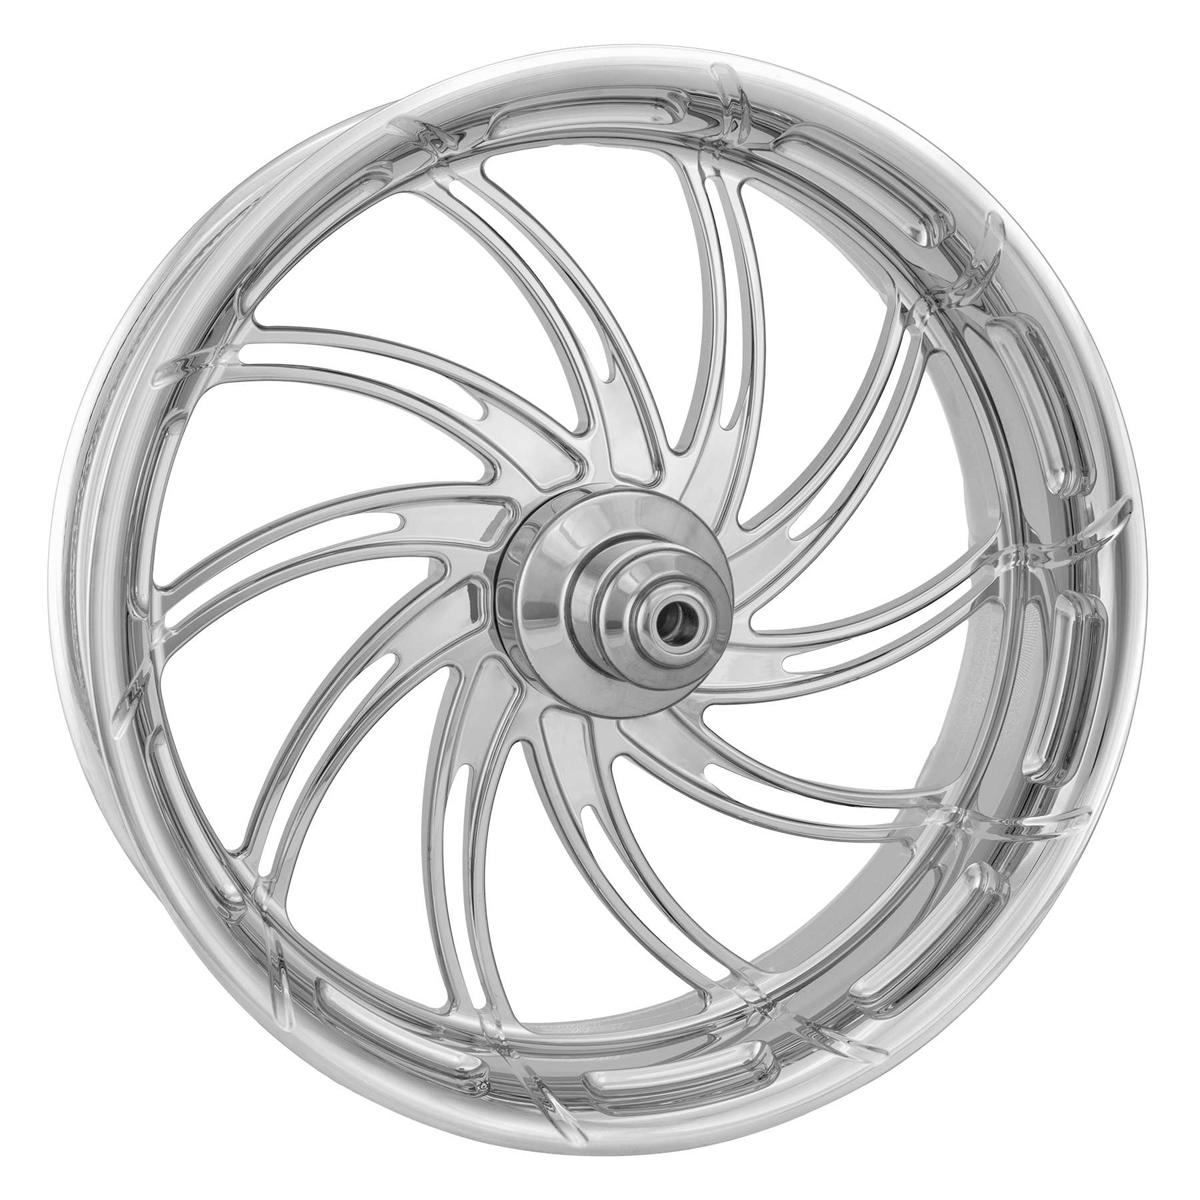 Performance Machine Supra Chrome Rear Wheel 18x4.25 Non-ABS